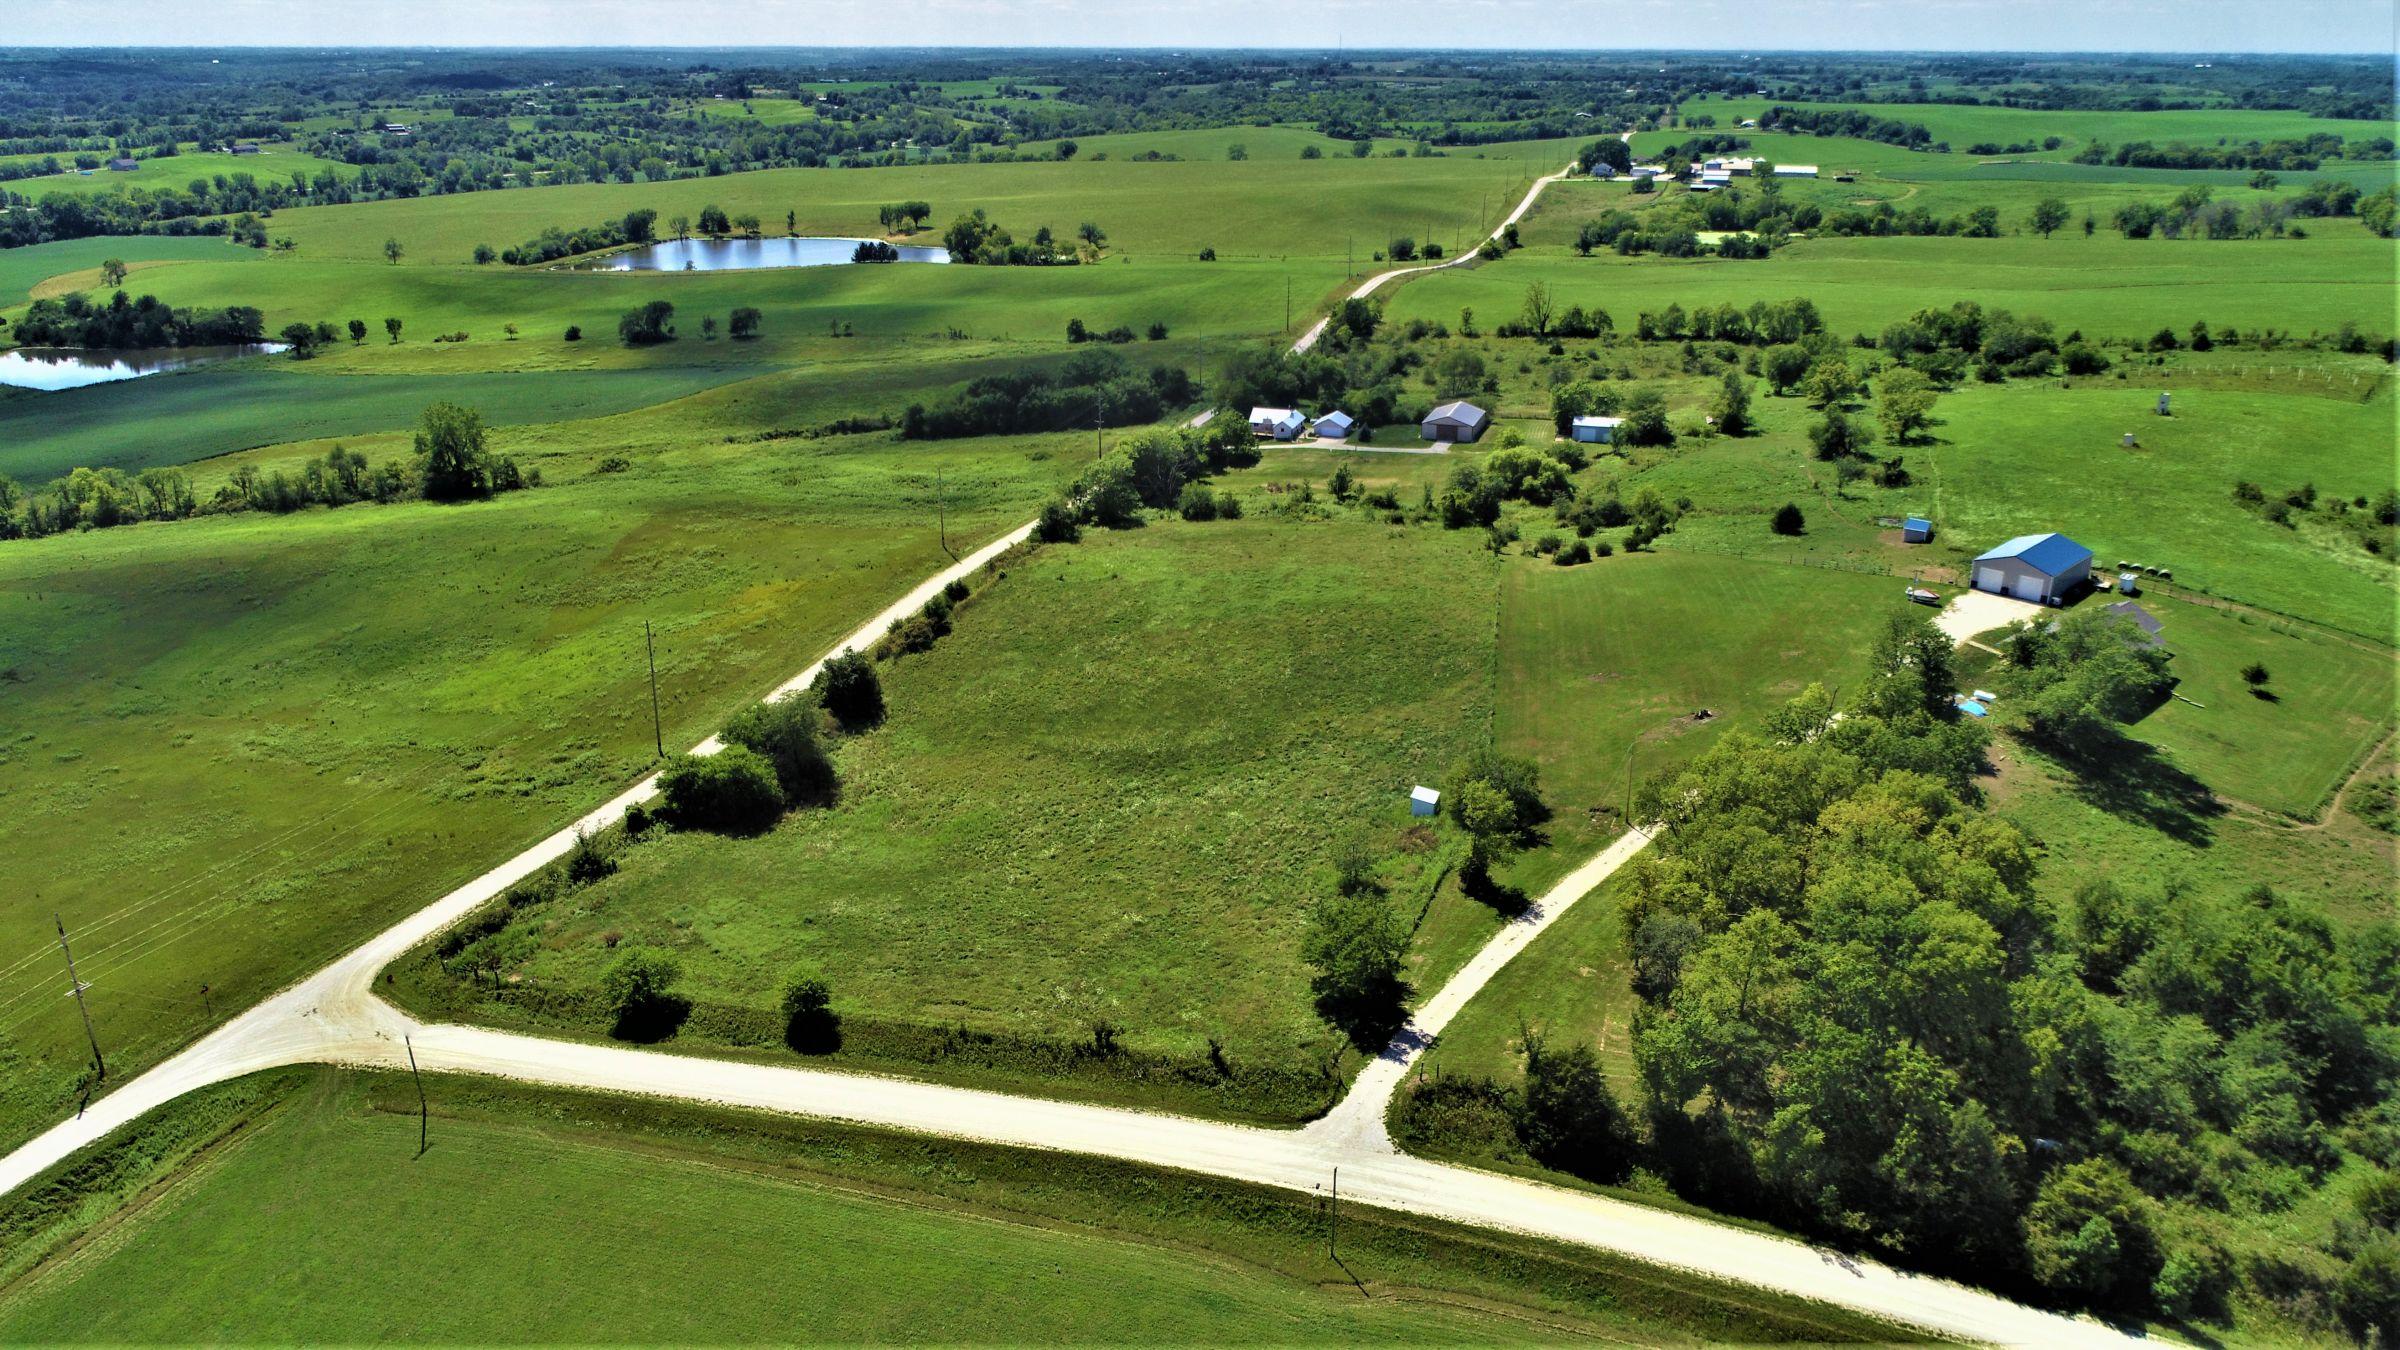 land-warren-county-iowa-6-acres-listing-number-15709-2-2021-08-27-202004.JPG